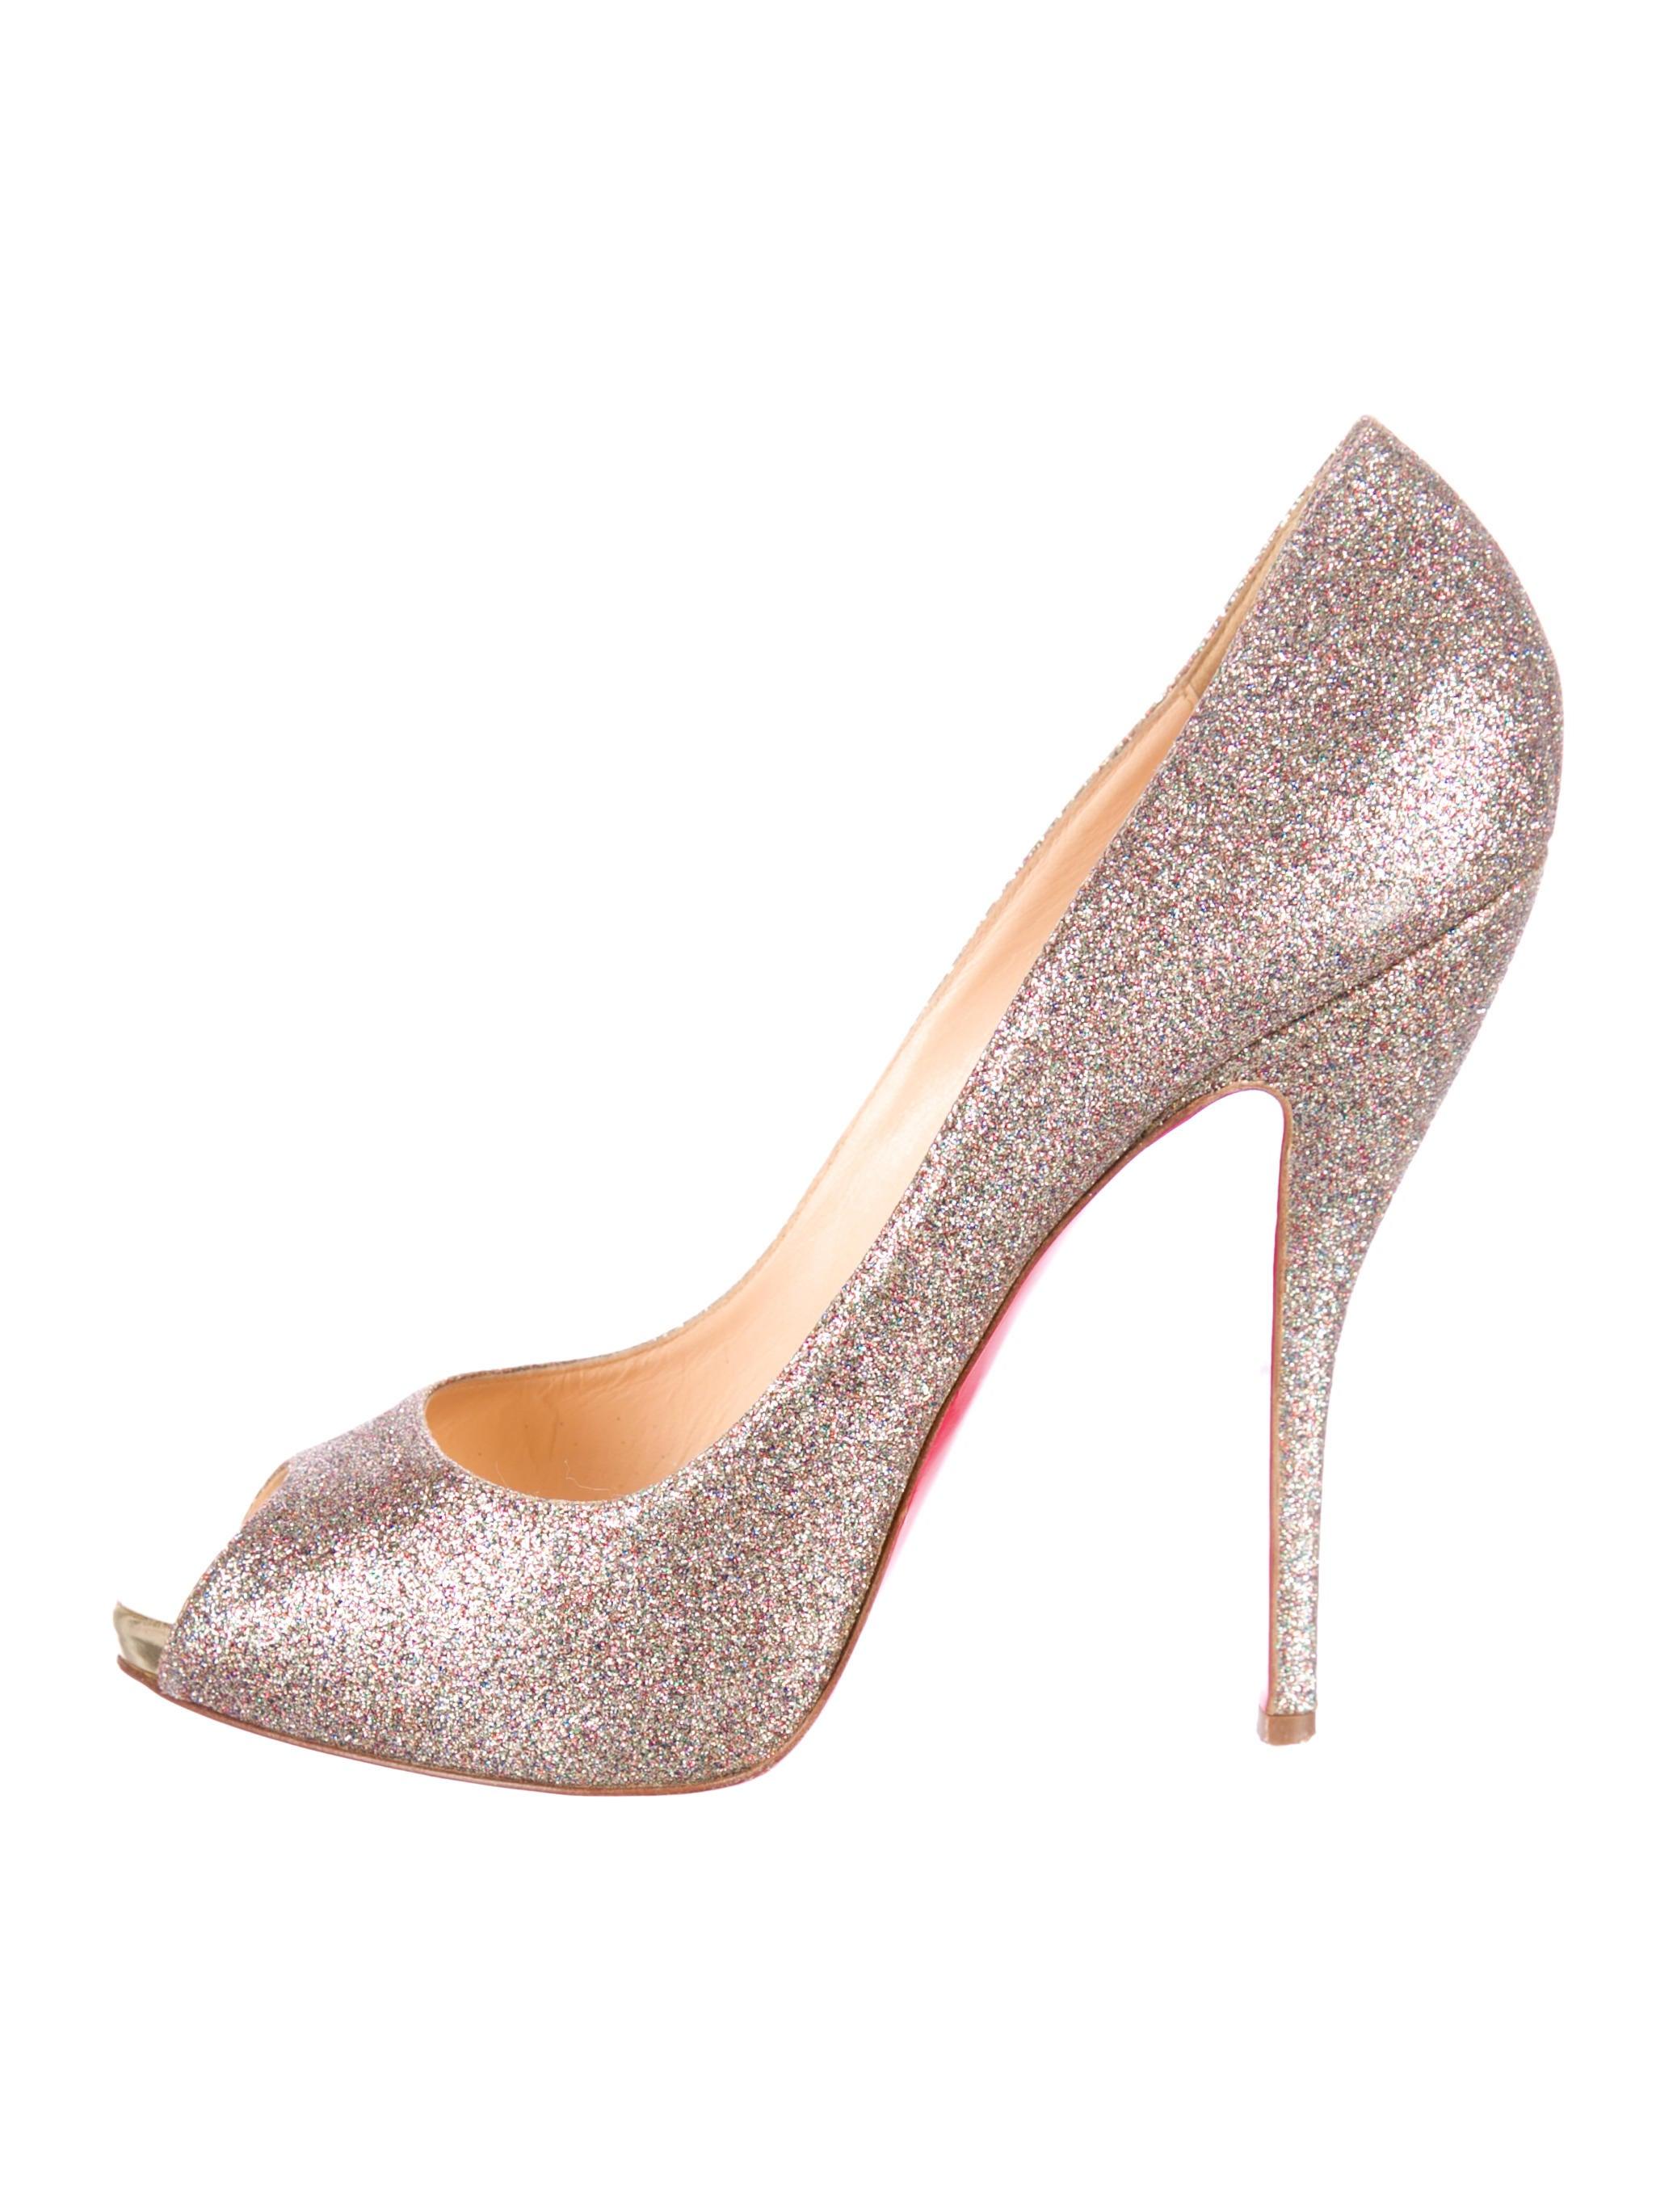 dc30522a6ba Artesur » christian louboutin leather peep-toe pumps Gold and ...